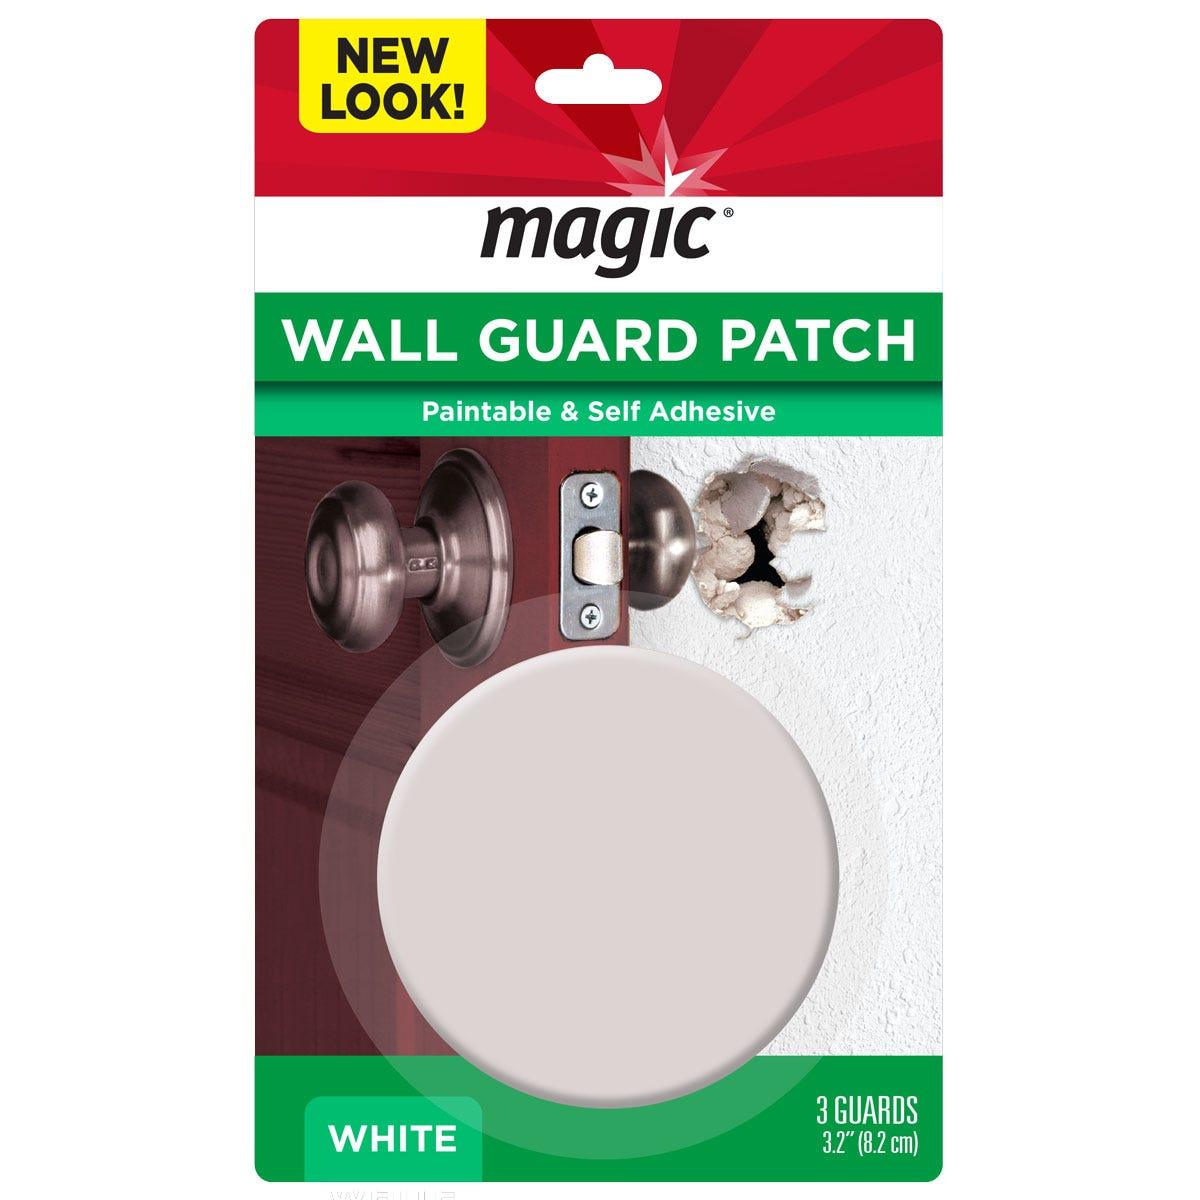 Magic Wall Guard Patch